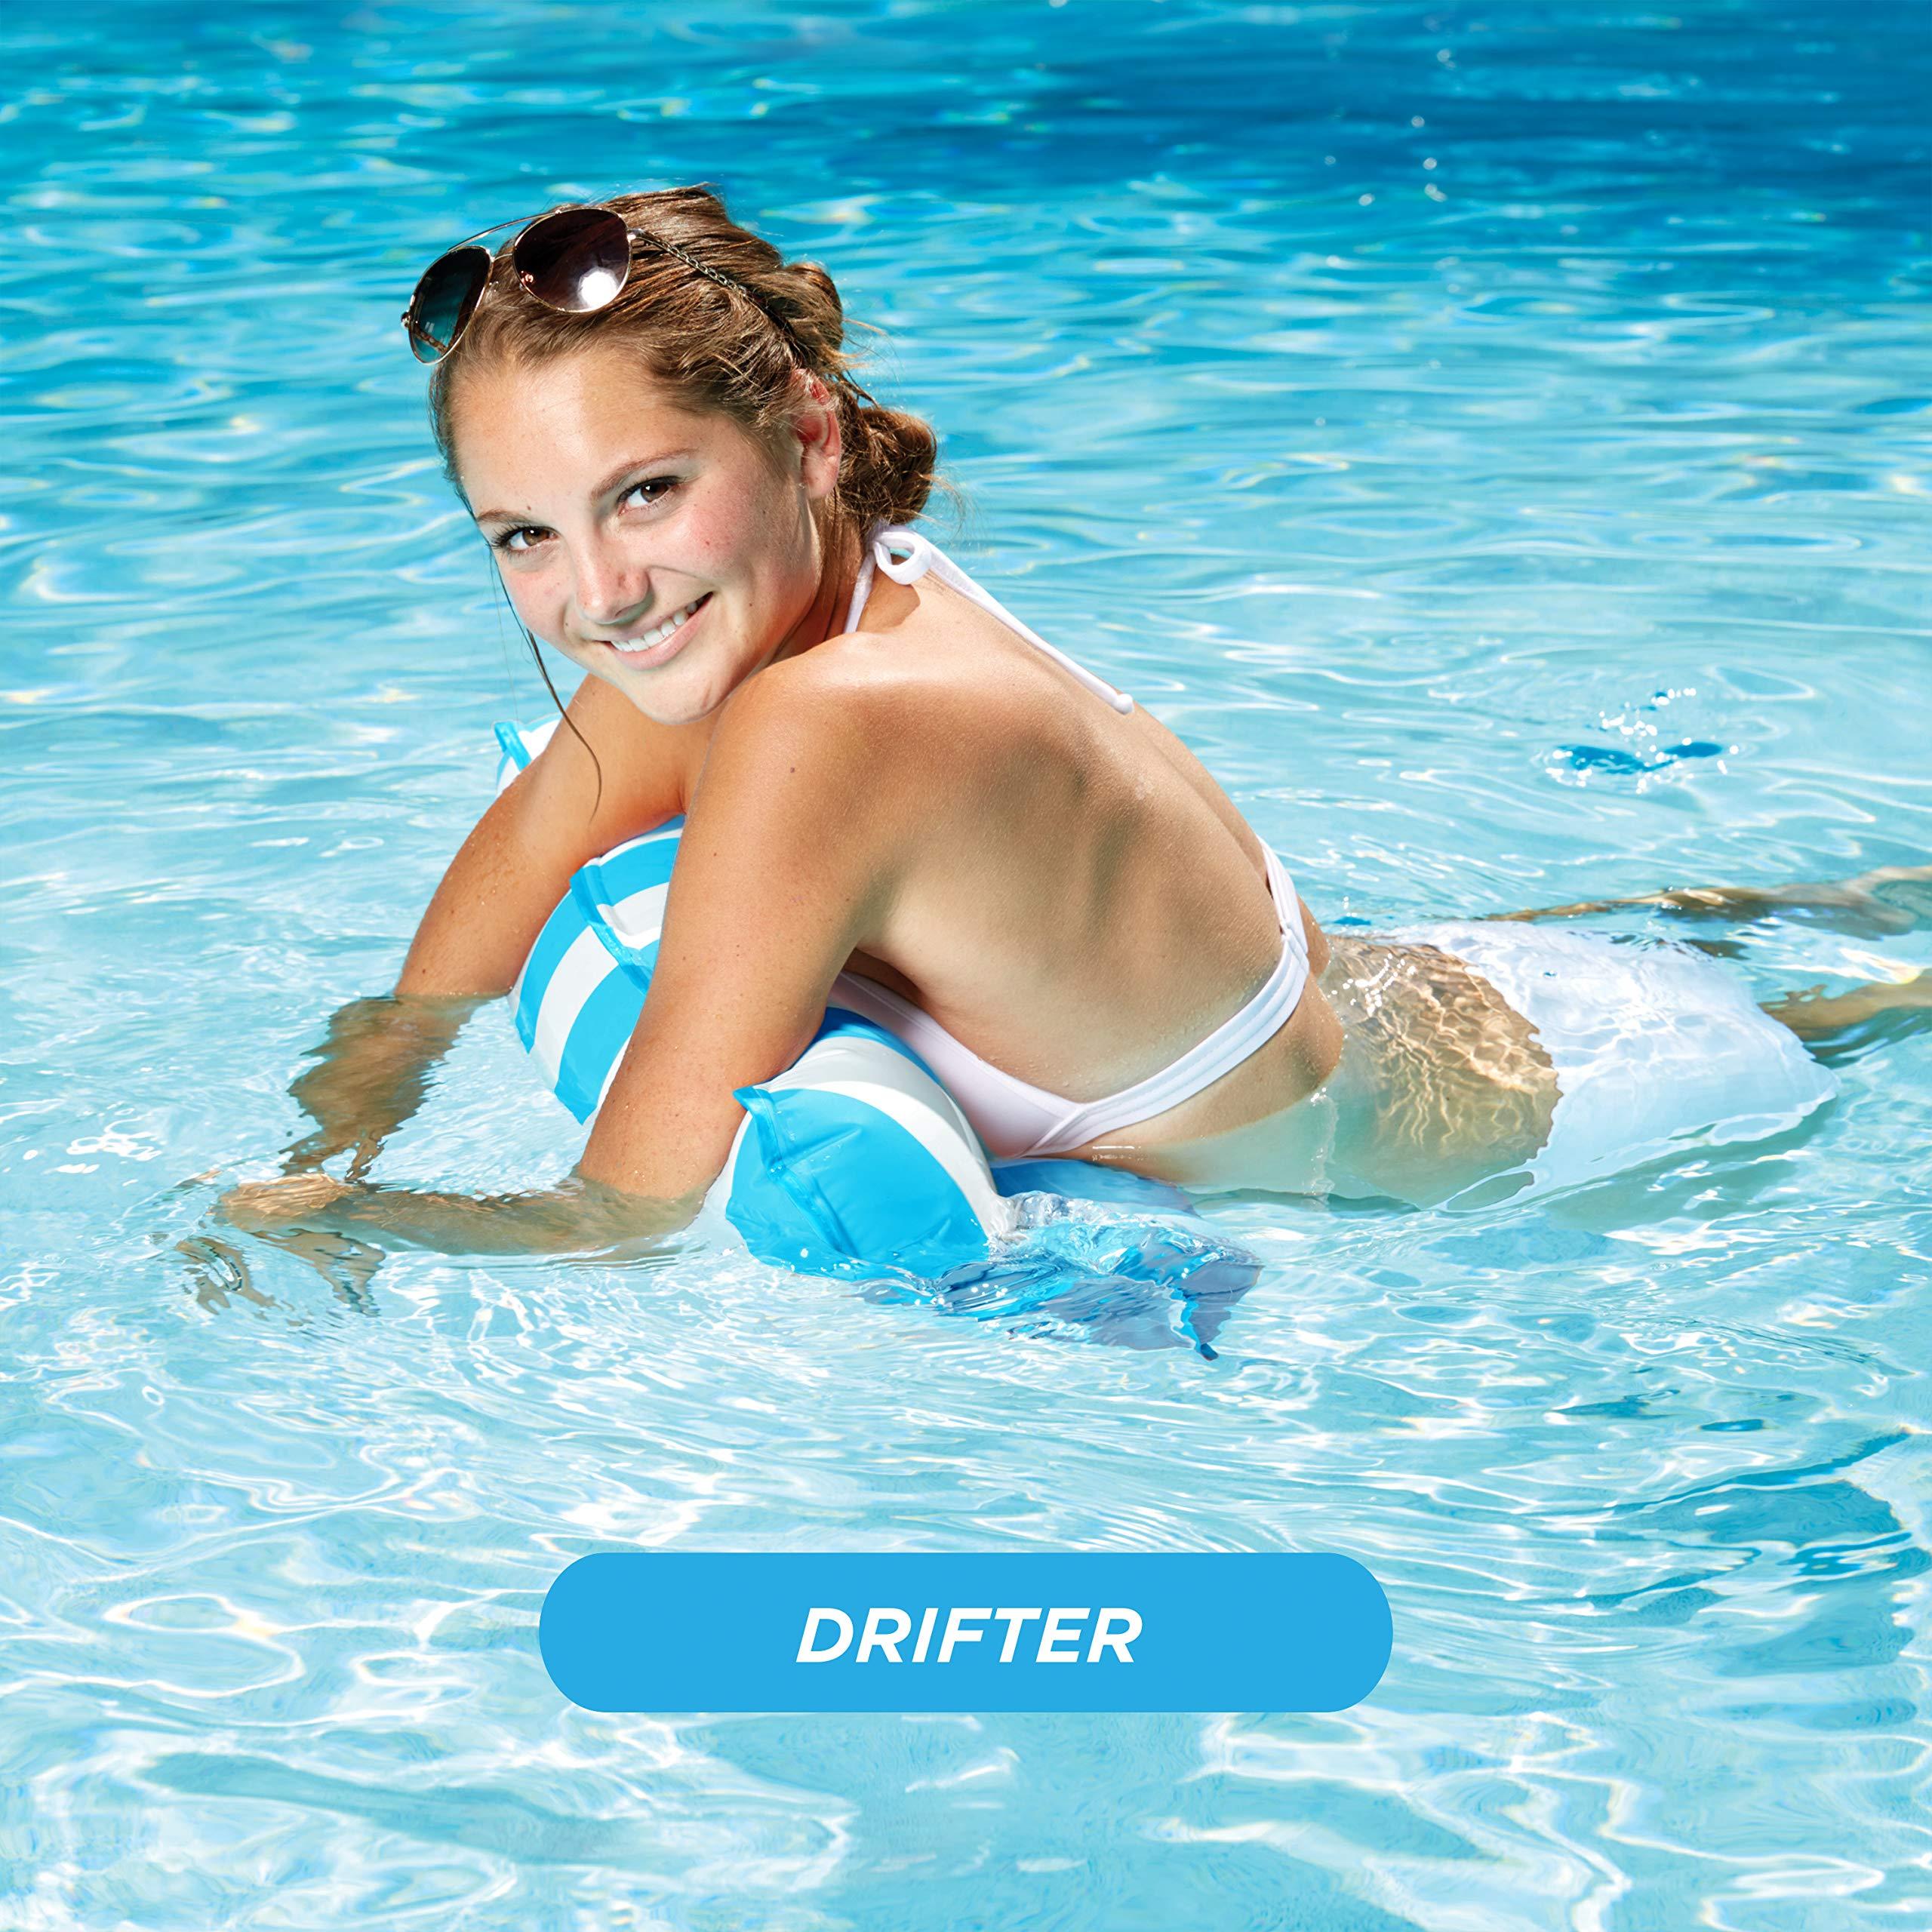 Aqua Monterey 4-in-1 Multi-Purpose Inflatable Hammock (Saddle, Lounge Chair, Hammock, Drifter) Portable Pool Float, Light Blue by Aqua (Image #3)